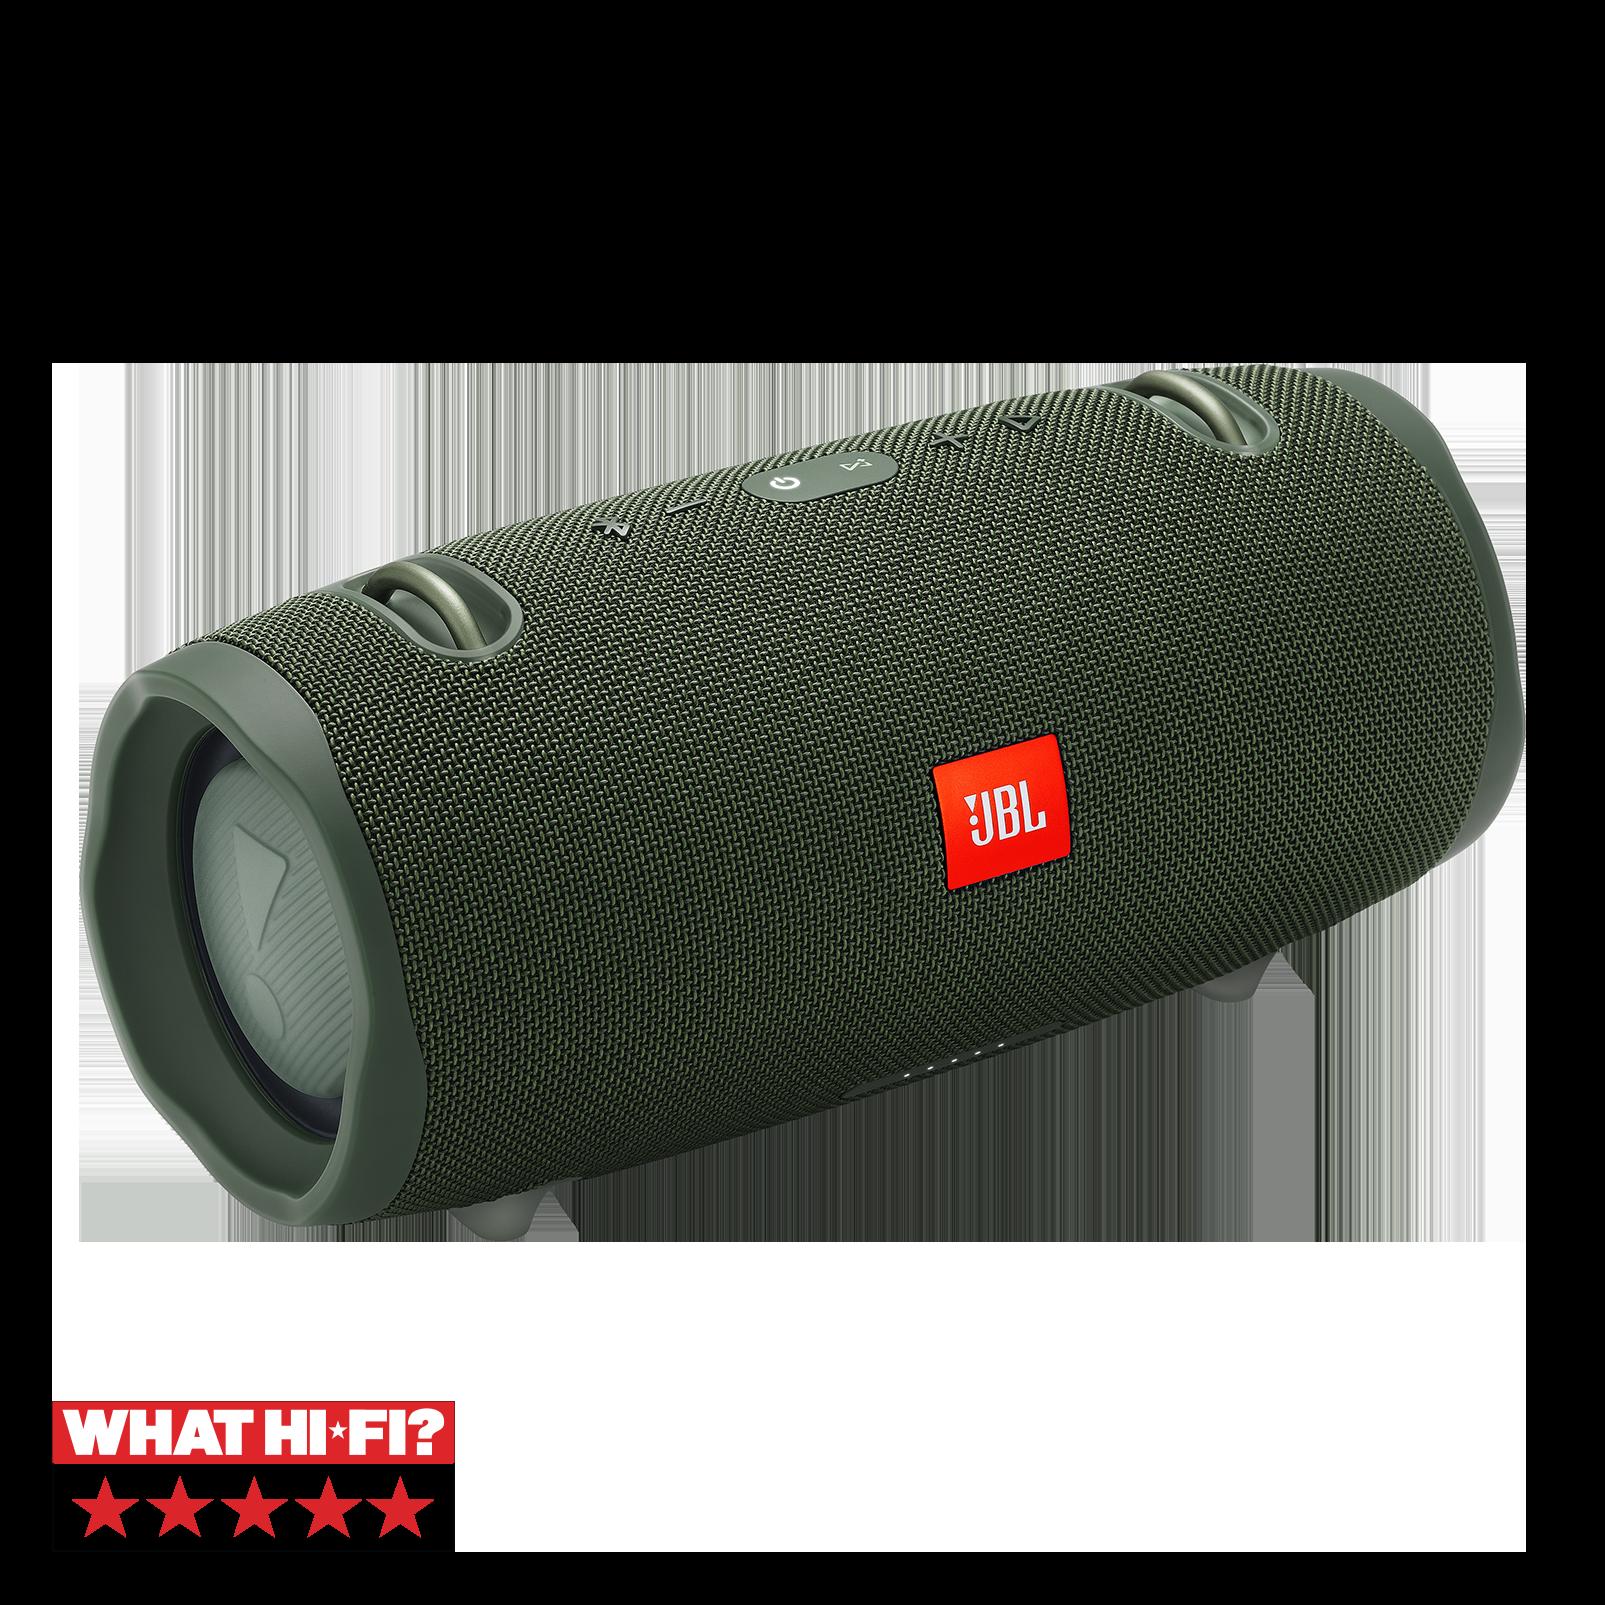 JBL Xtreme 2 - Forest Green - Portable Bluetooth Speaker - Hero